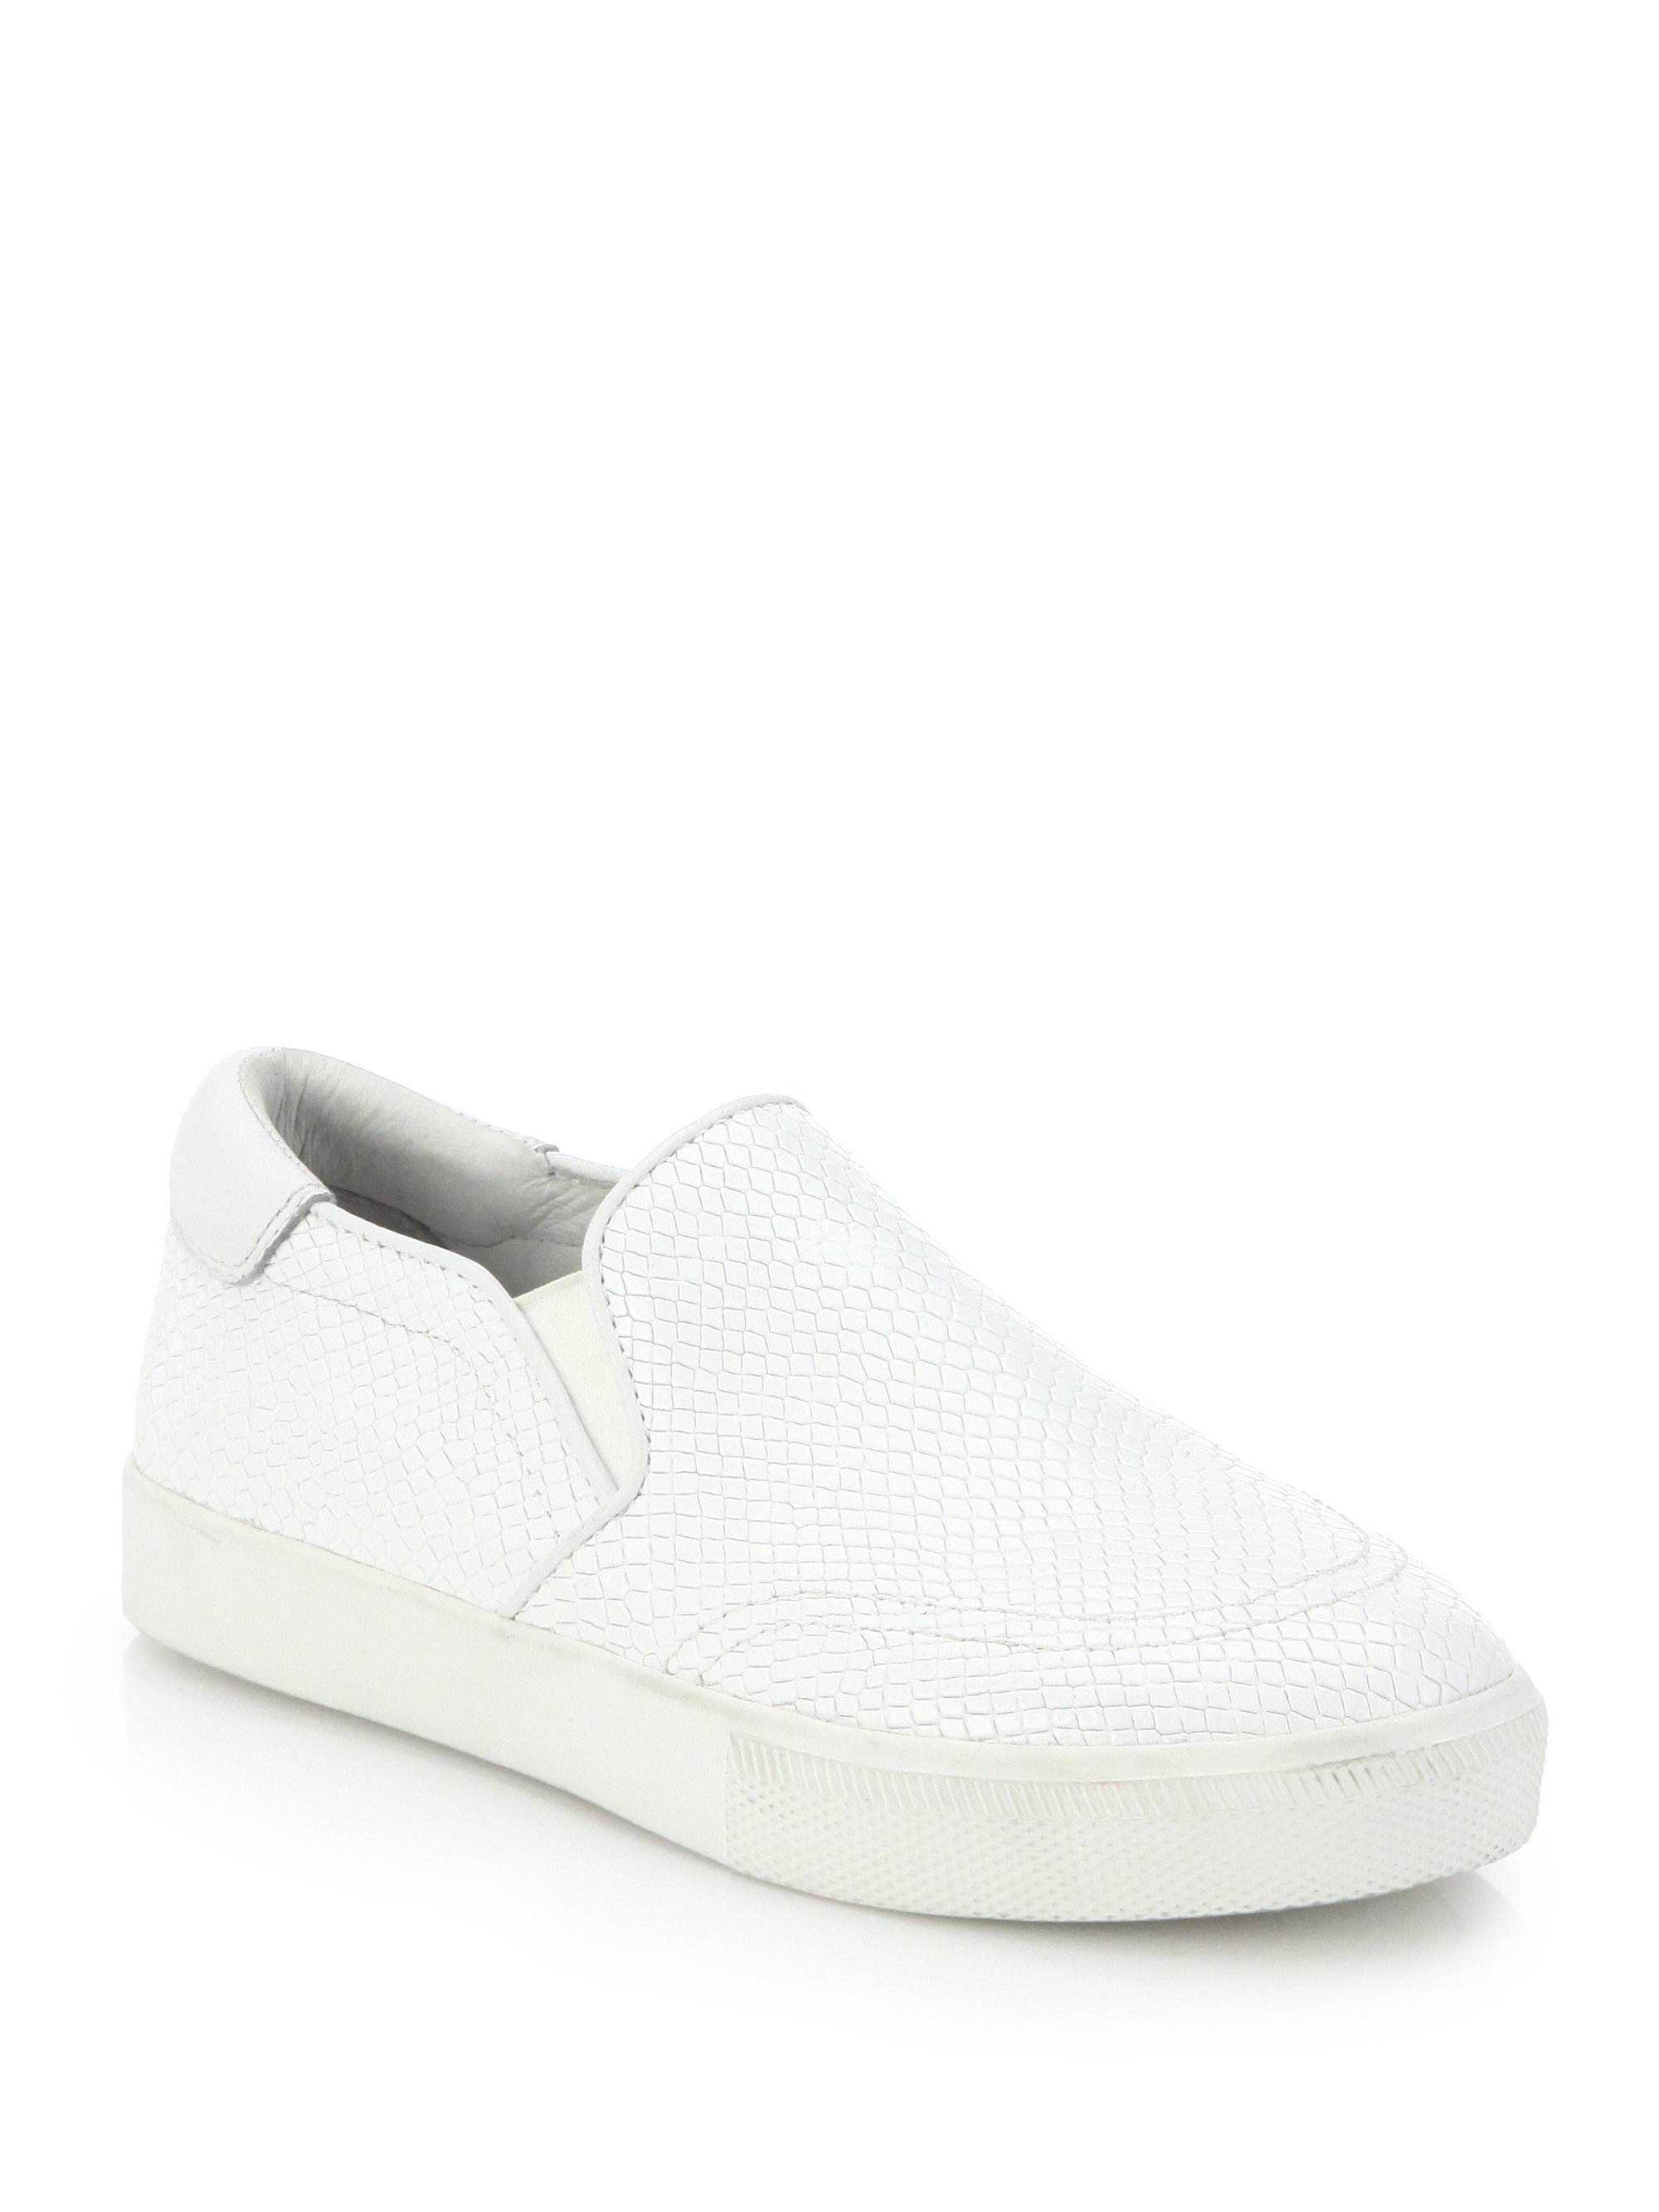 ash impulse embossed leather slip on sneakers in white lyst